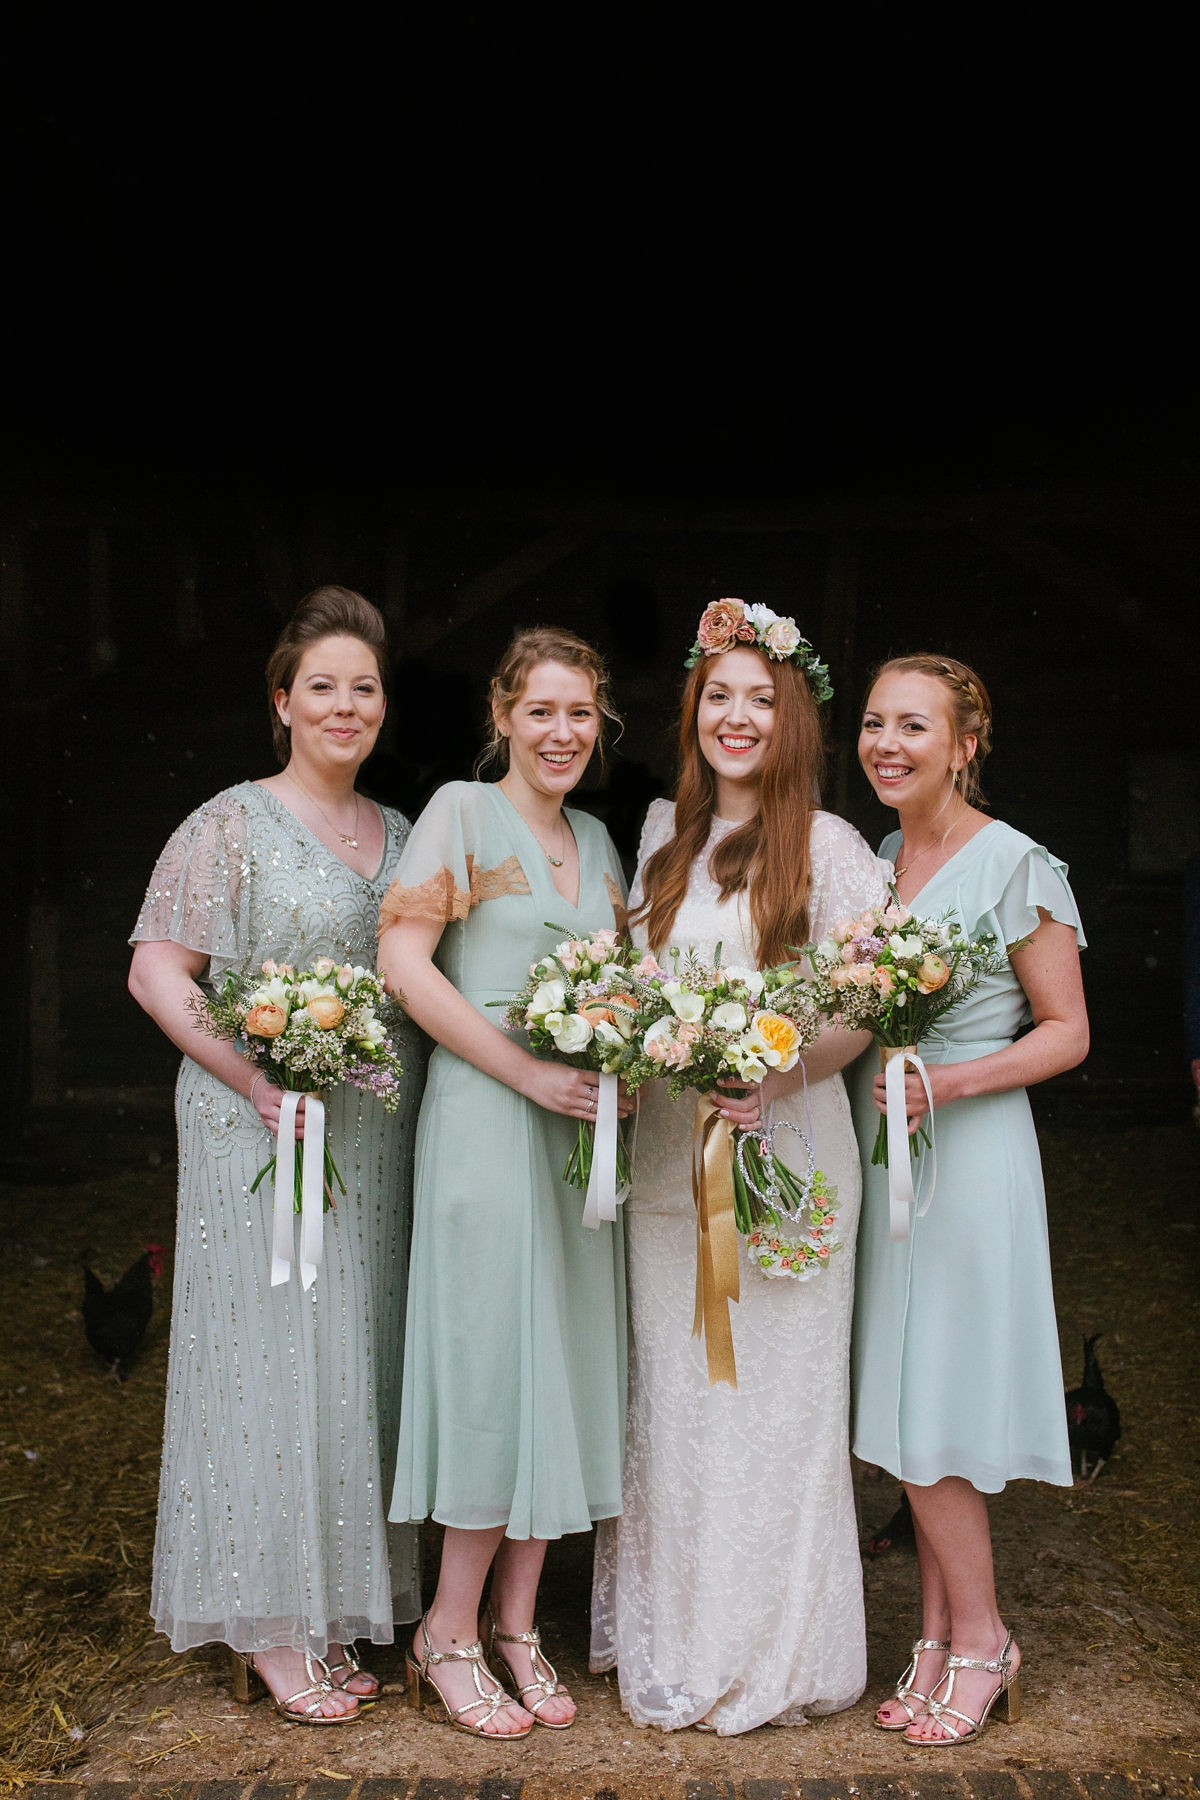 ec8cdc2e8a ... A minna eco friendly dress rainy day wedding Photography by Emma Case -  Two Childhood Sweetheart ...